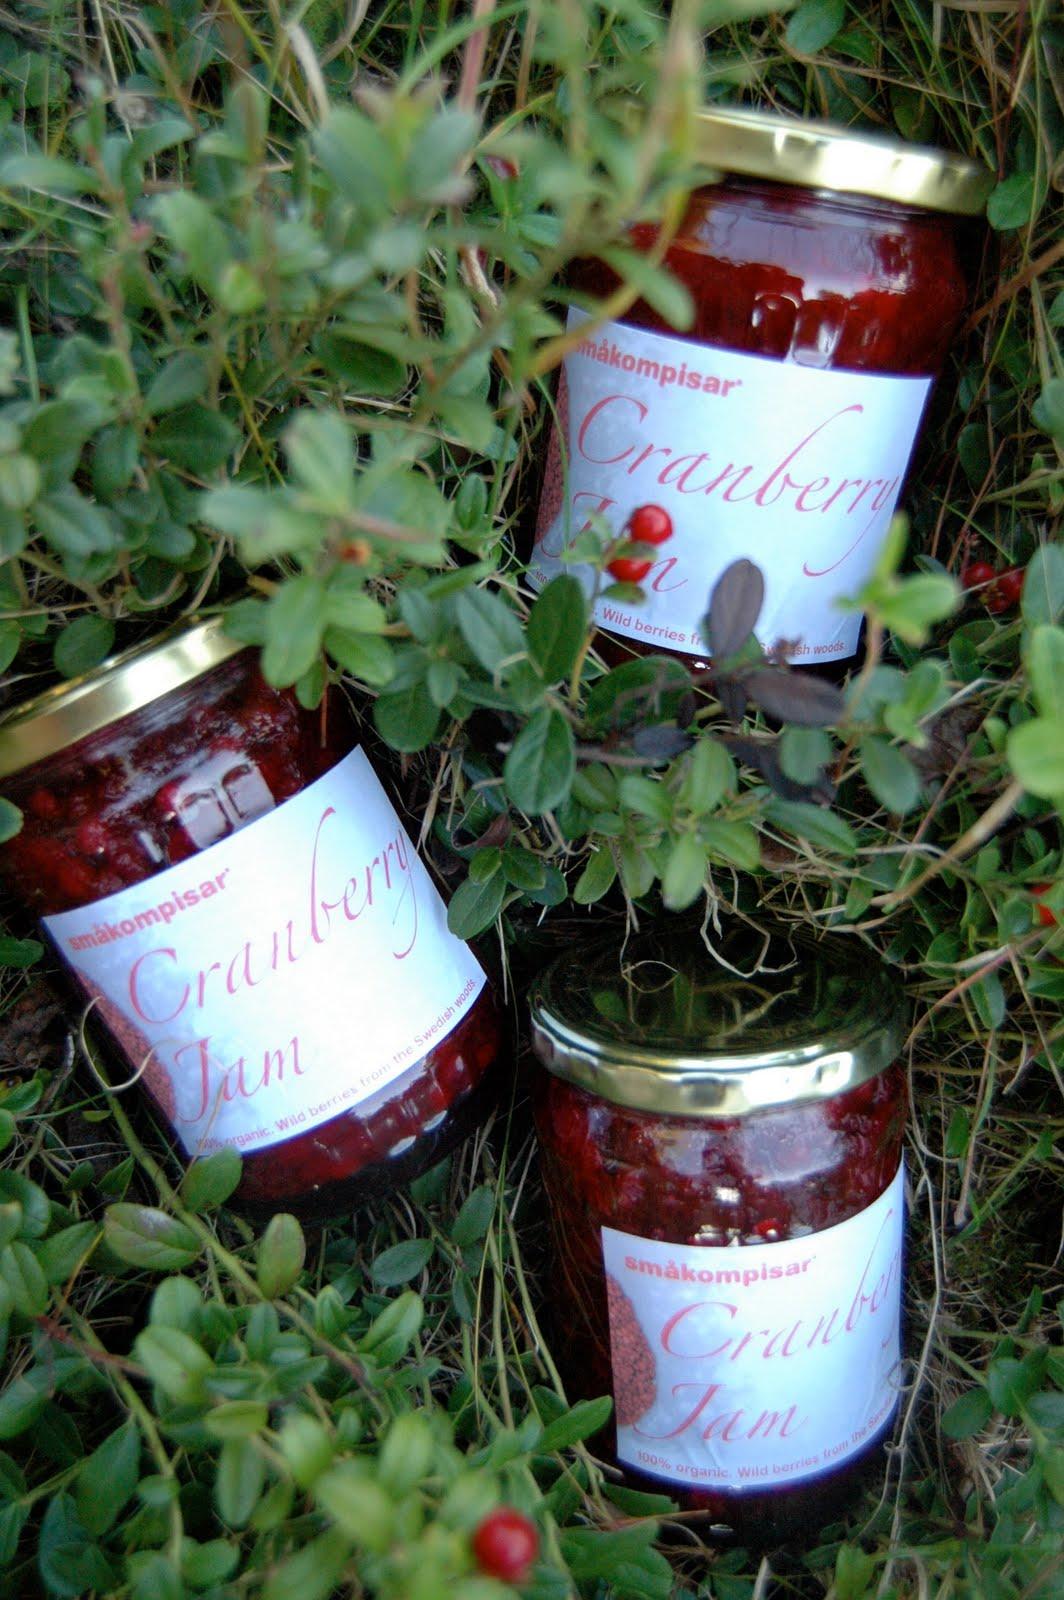 Småkompisar: Organic Lingonberry/Wild Mountain Cranberry Jam!